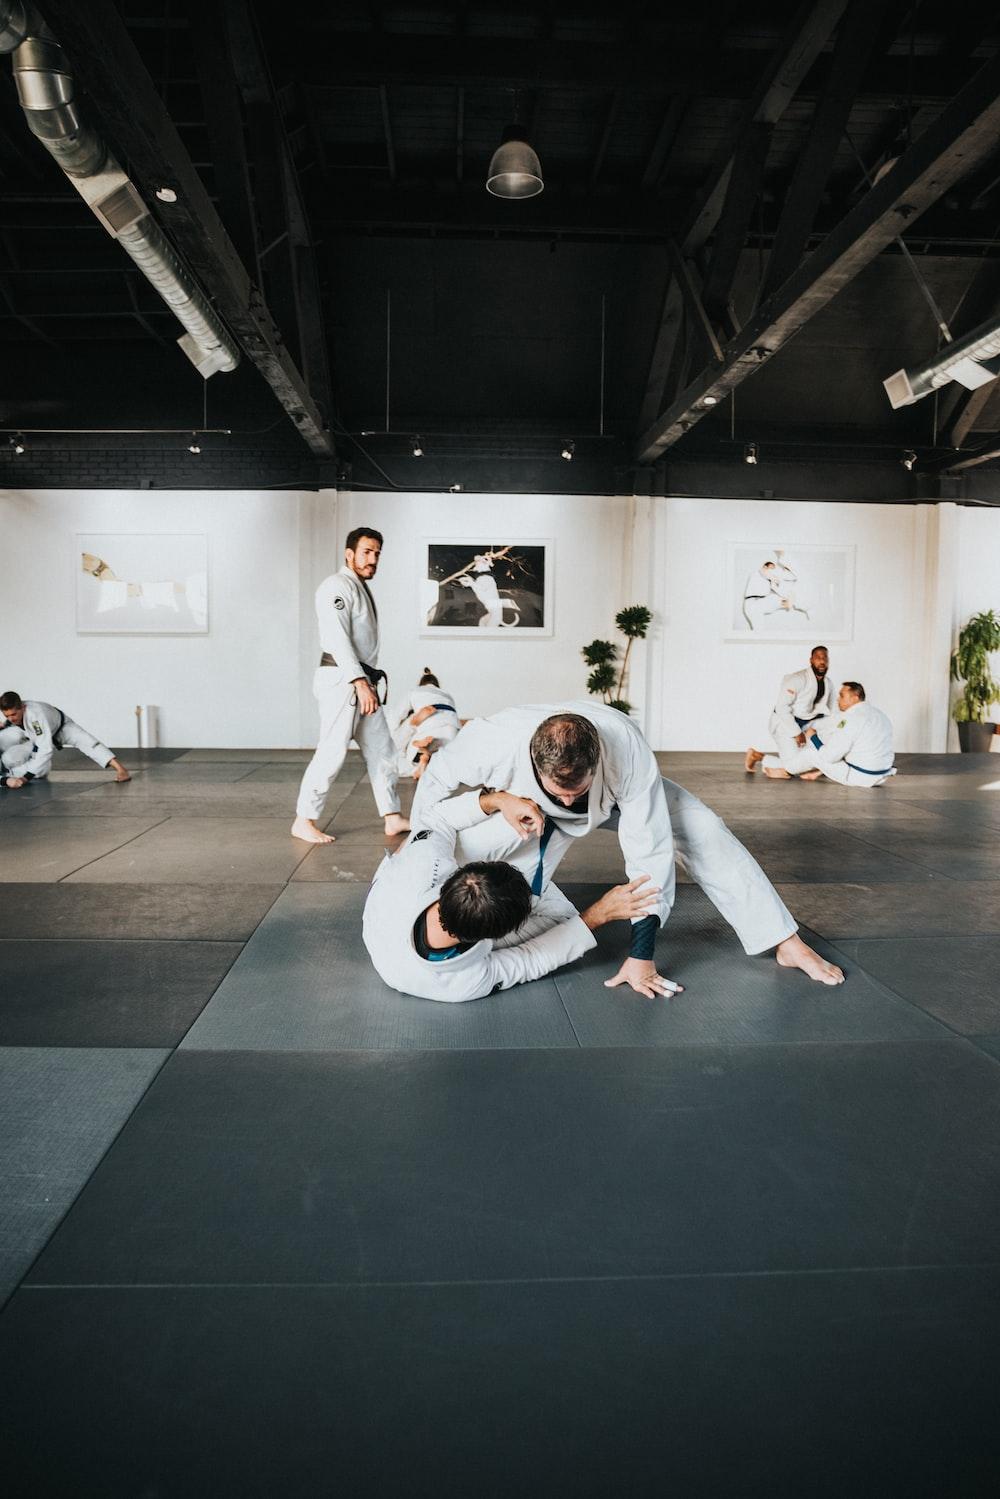 man in white long sleeve shirt and black pants sitting on black floor